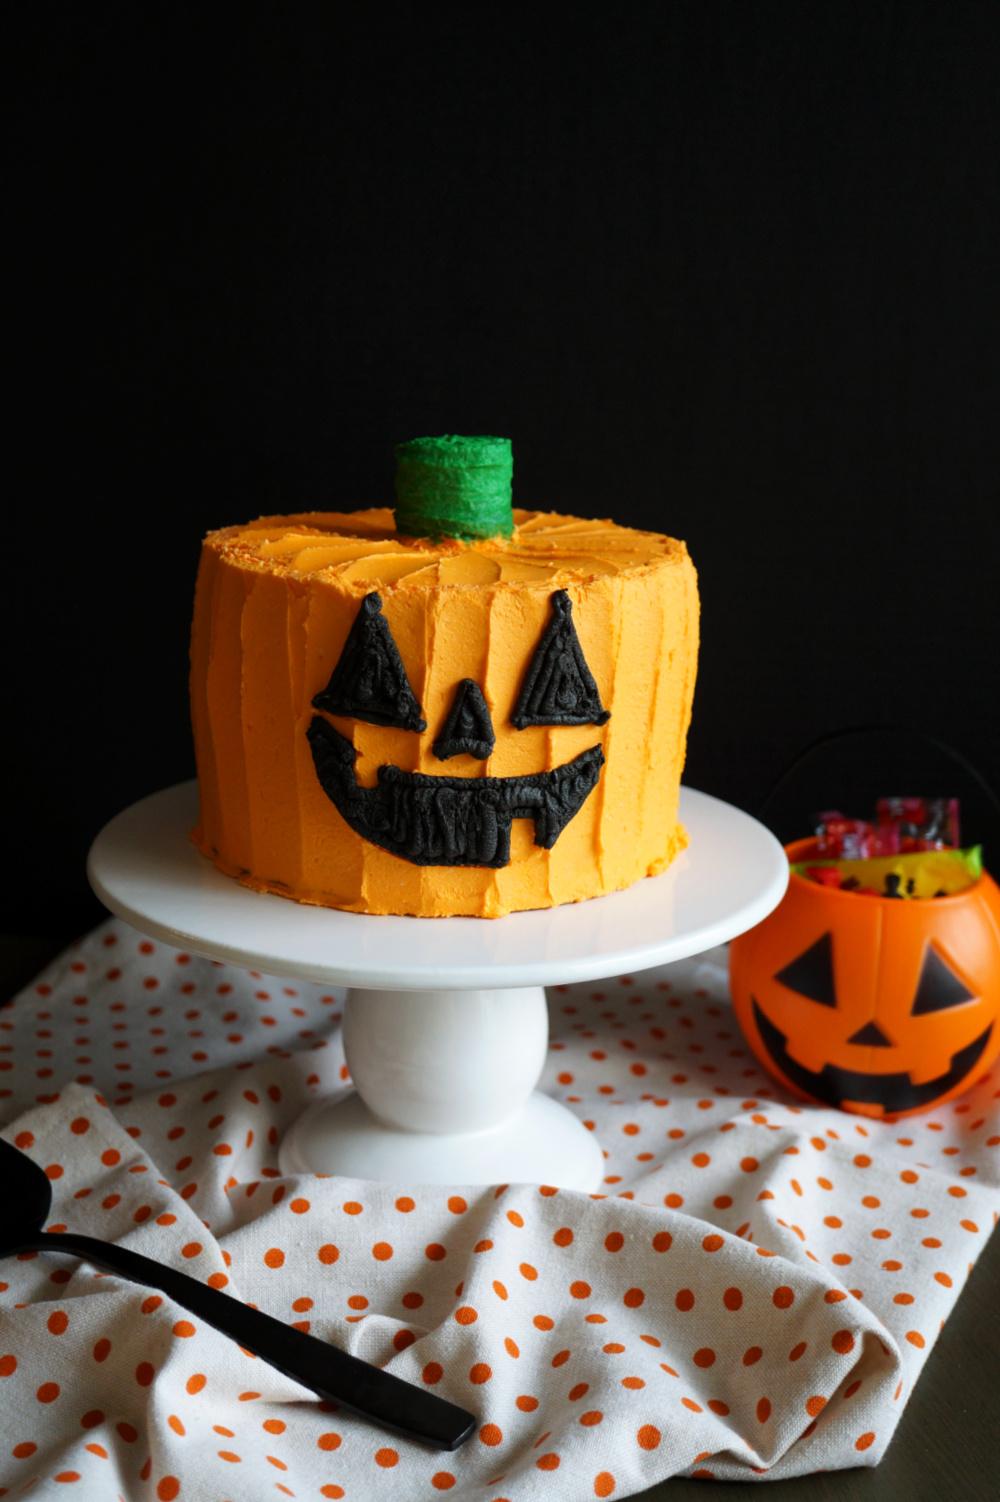 jack o'lantern cake on cake stand